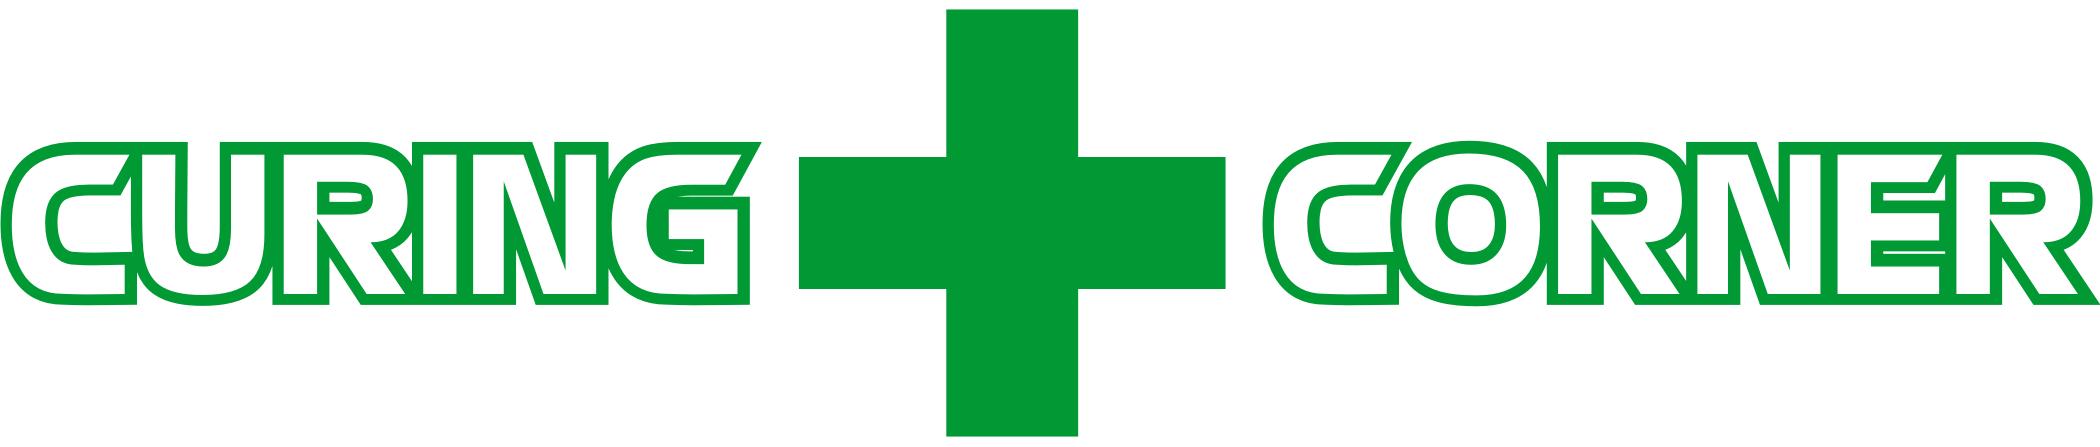 Curing Corner horizontal logo-trans BG